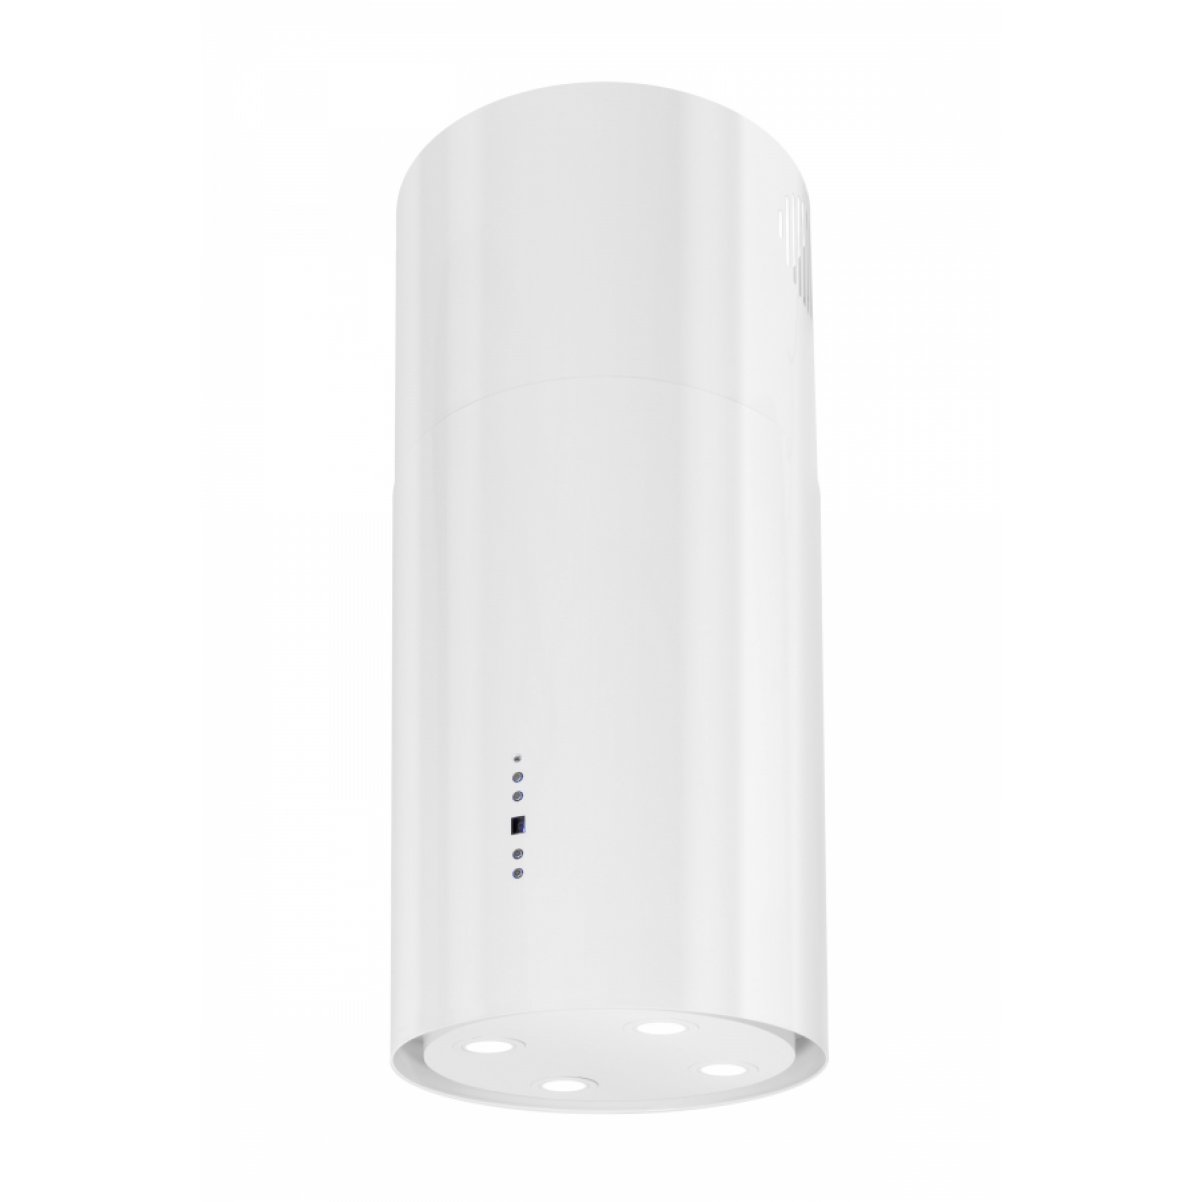 Design frihängande cylinderformad köksfläkt Explorer Lyx |vit